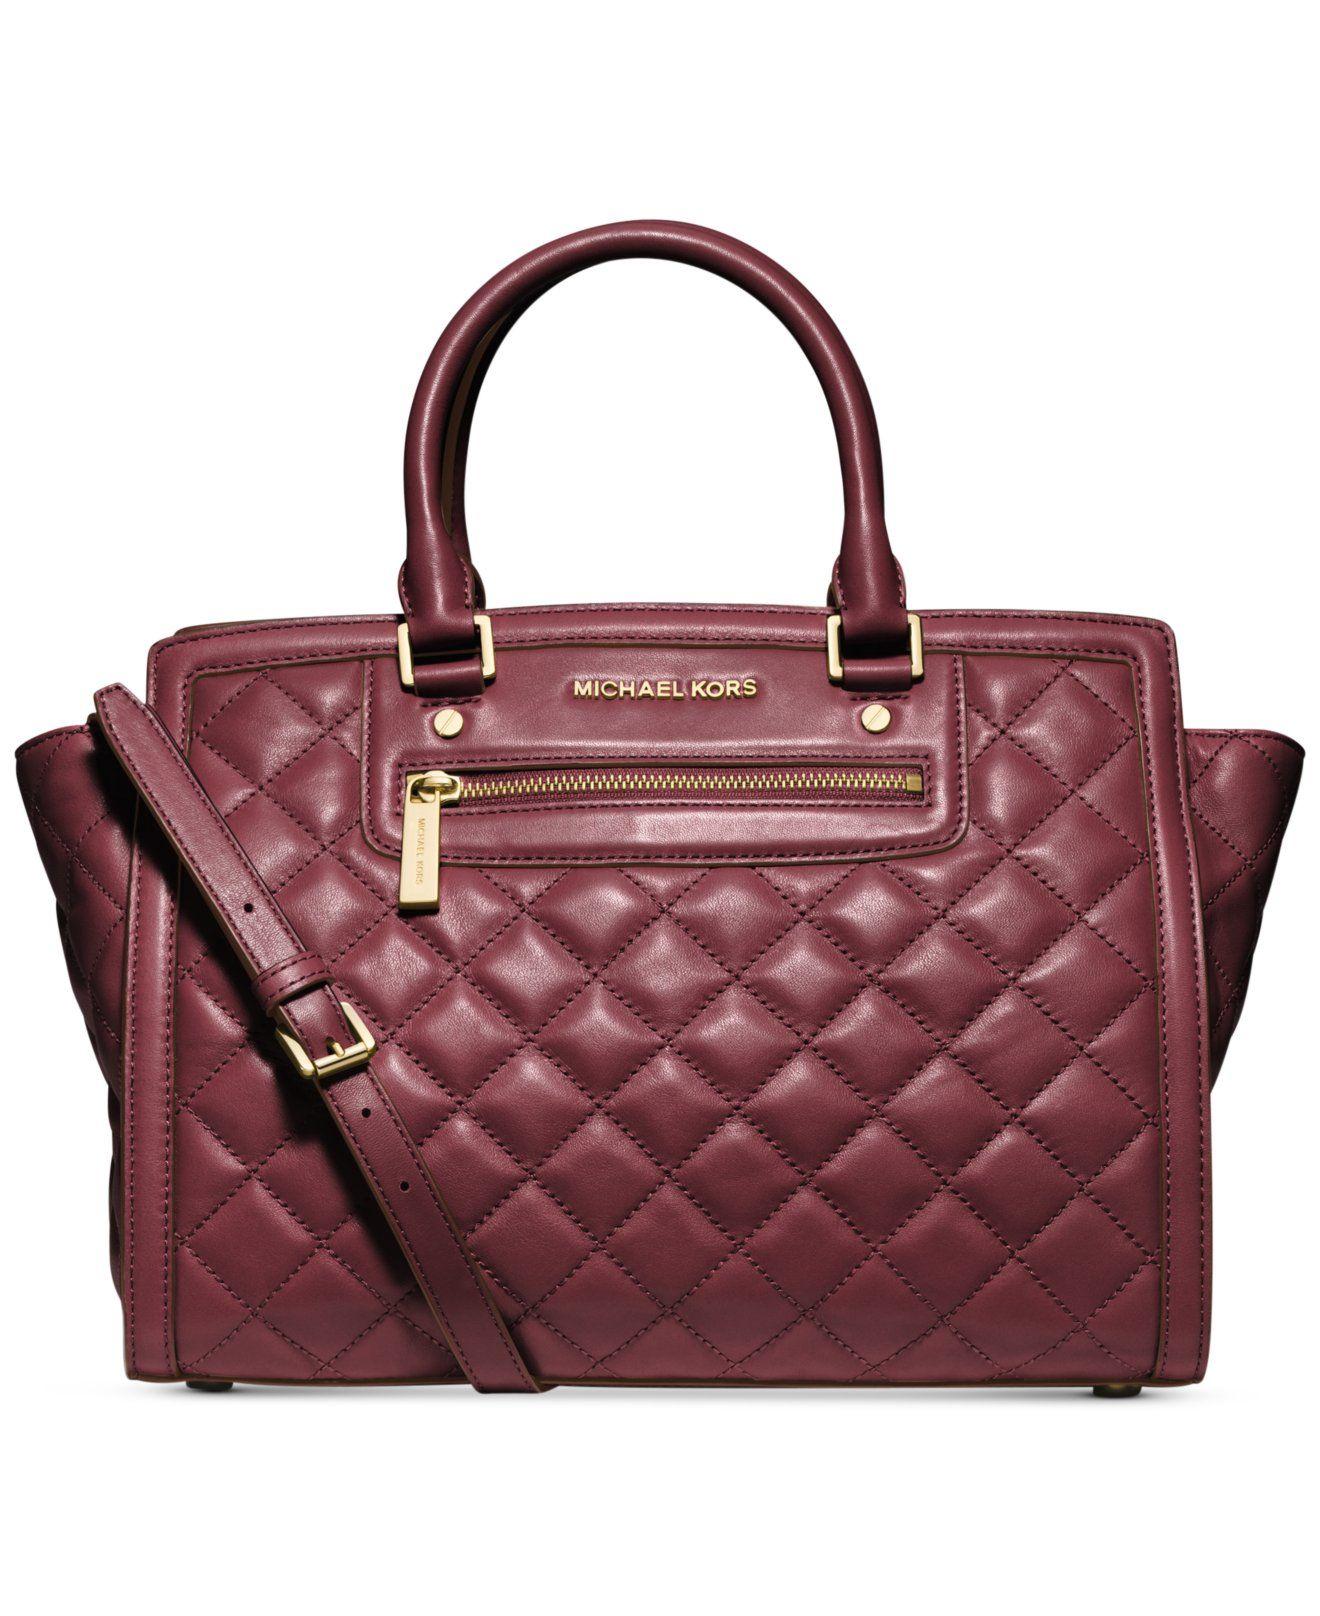 e6d50e8162362 MICHAEL Michael Kors Selma Zip Quilt Large Satchel - Michael Kors Handbags  - Handbags   Accessories - Macy s